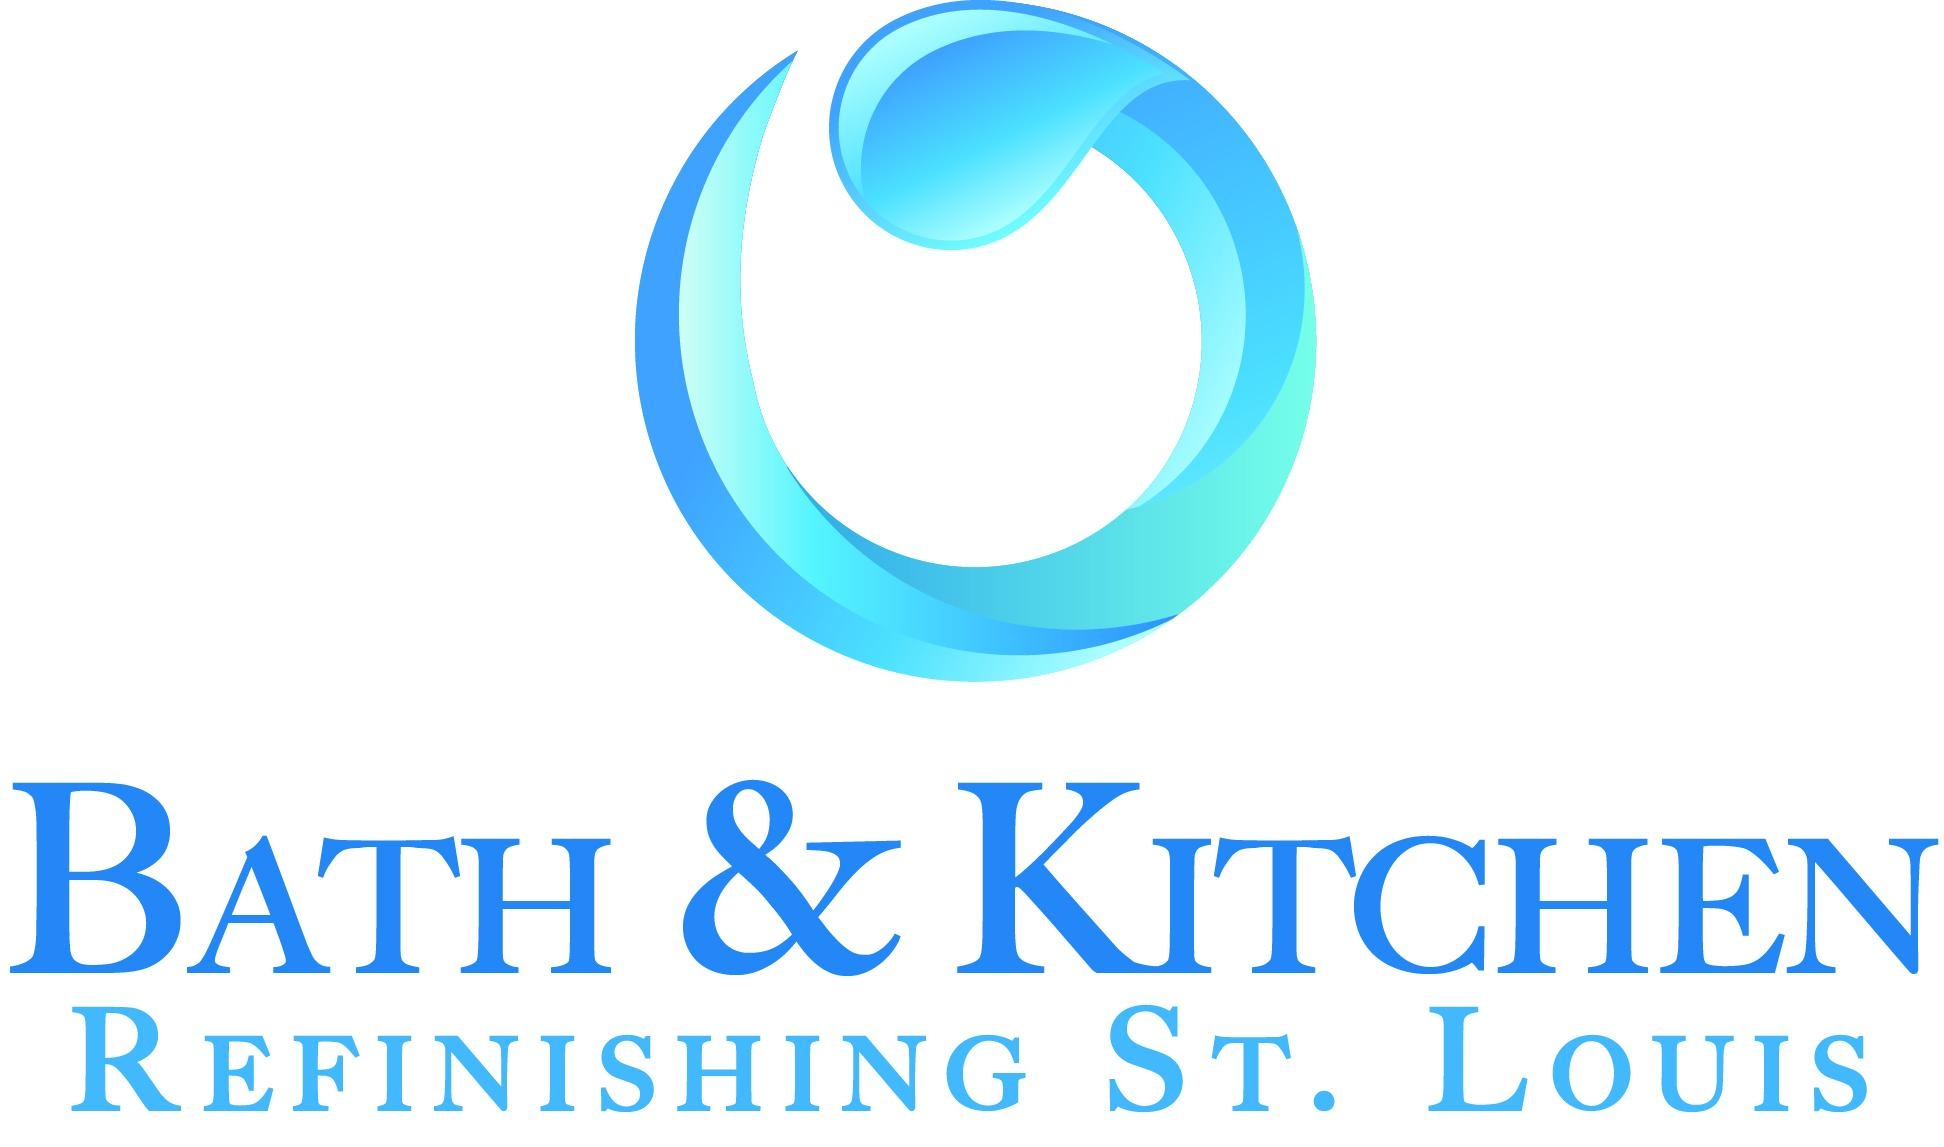 Rhode Island Kitchen Bath Inc